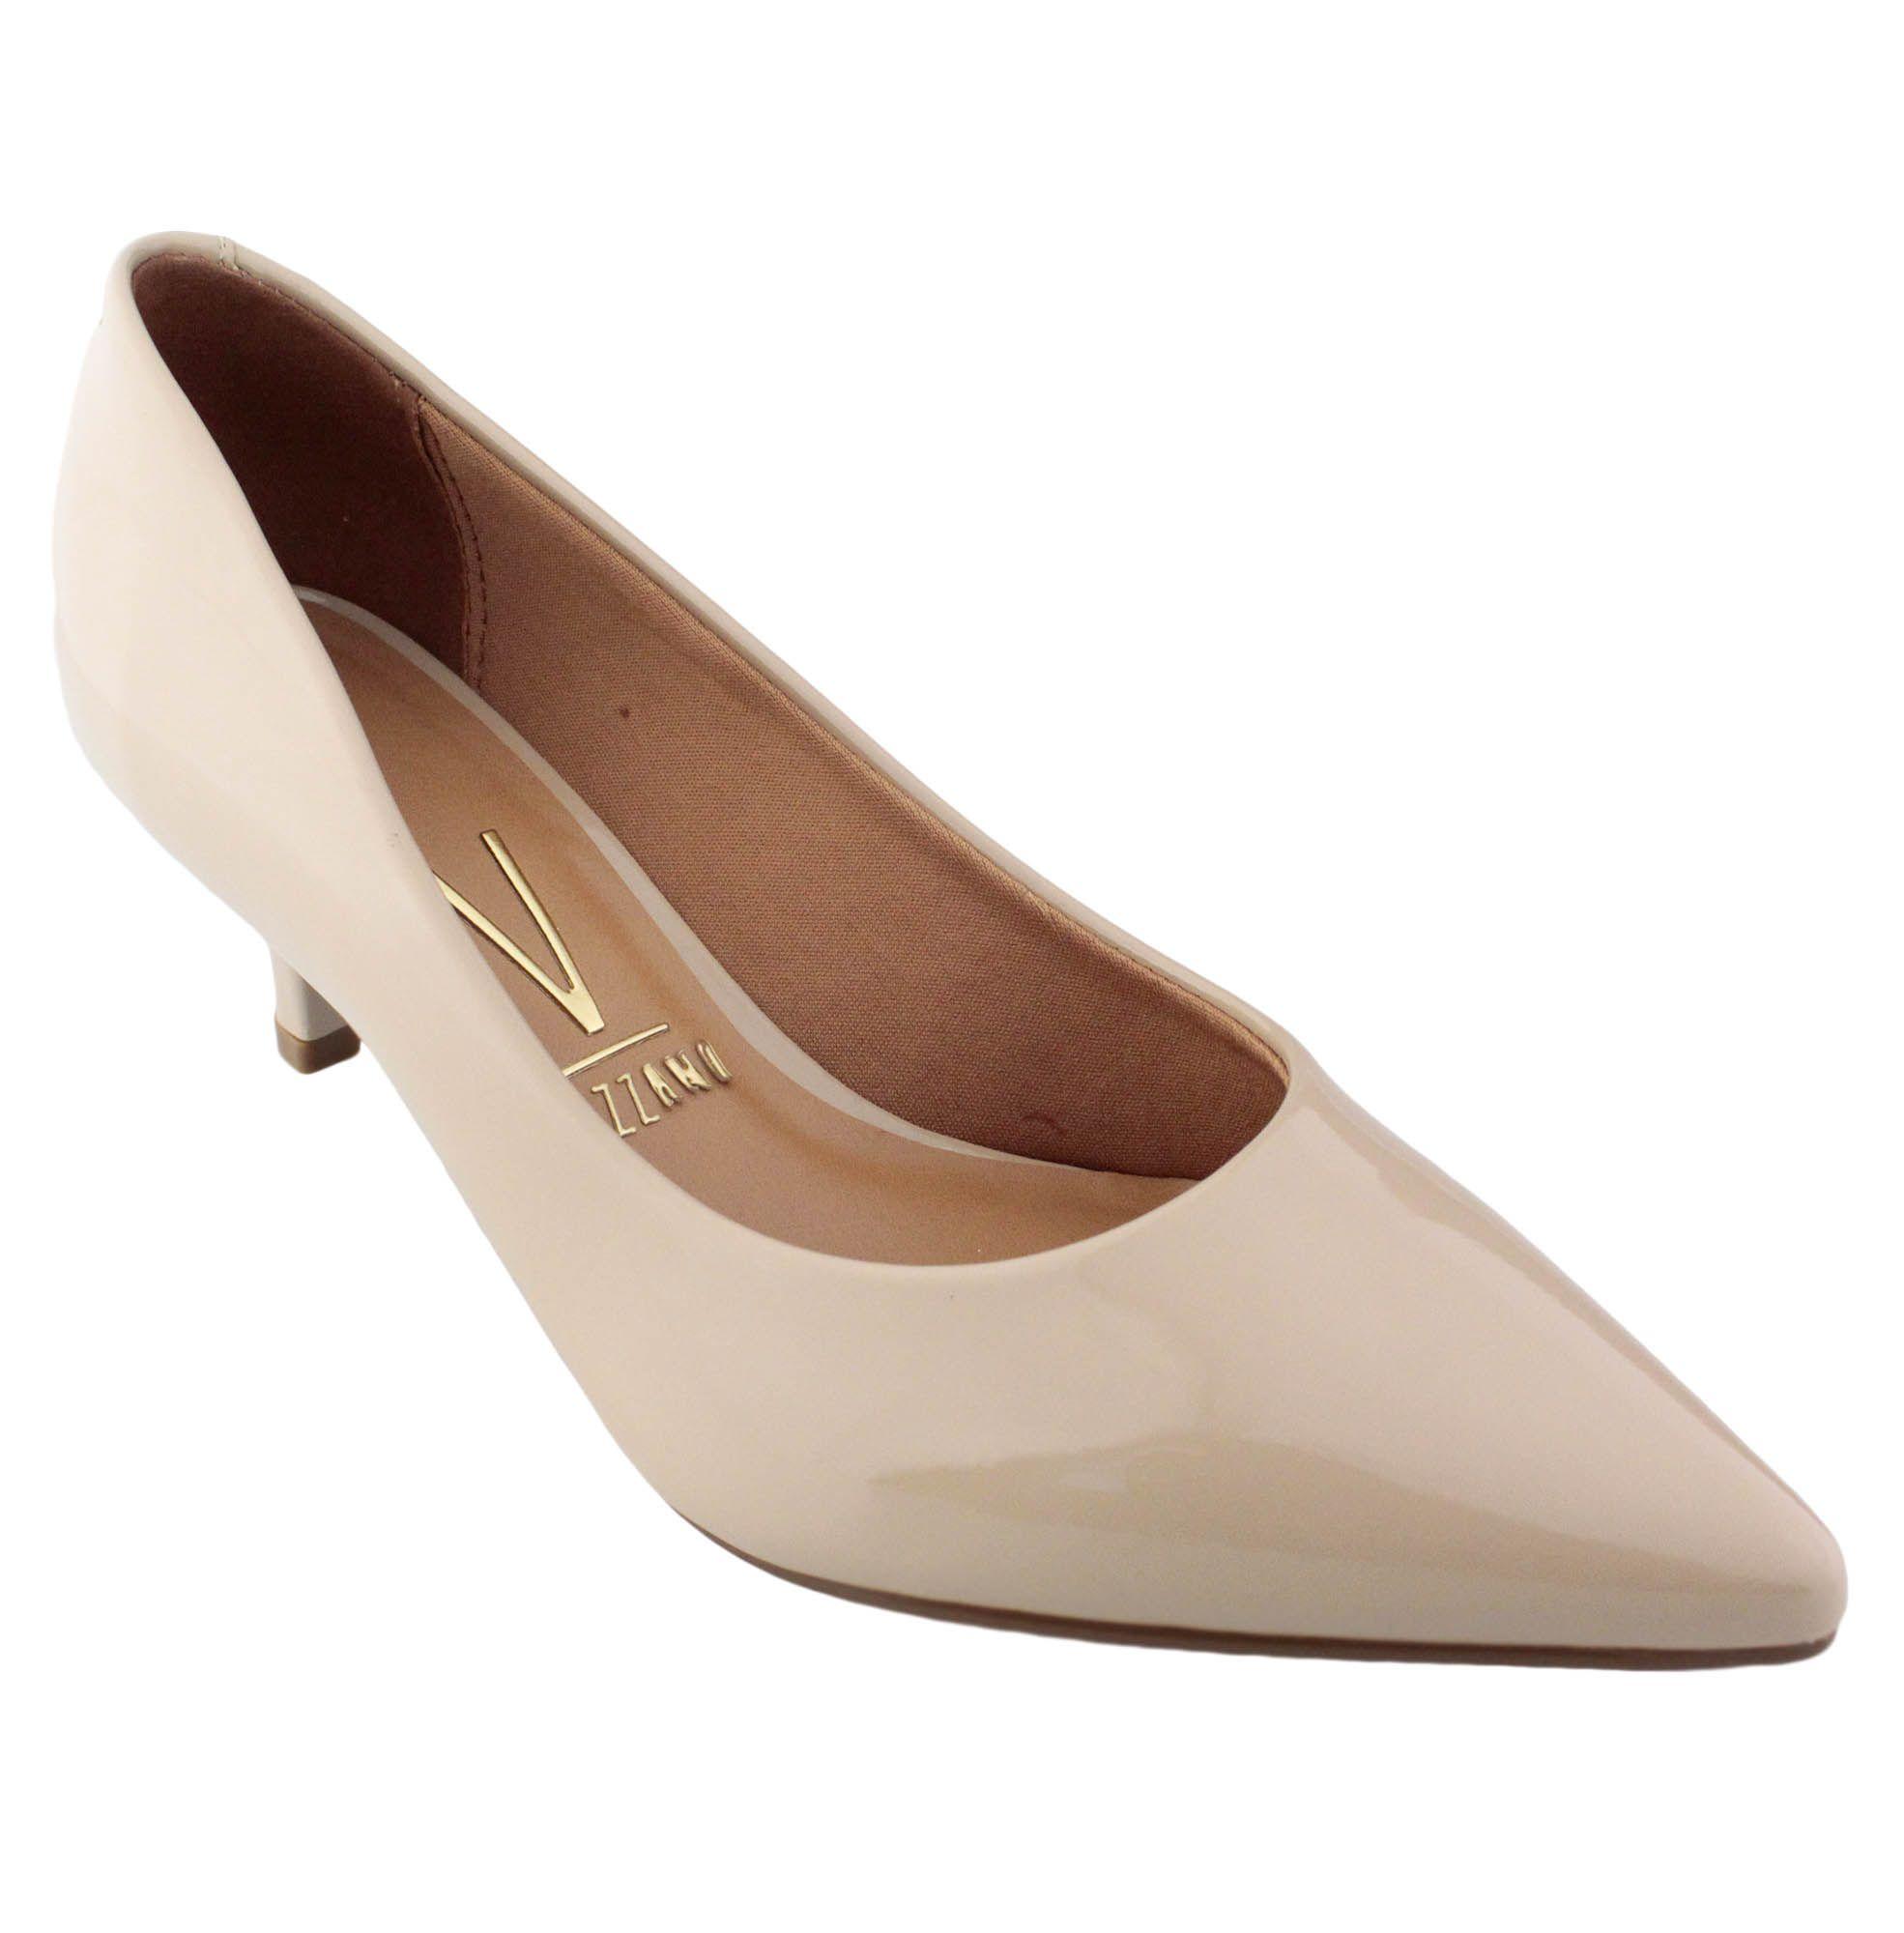 Sapato Feminino Vizzano Scarpin Salto Fino Verniz - 1122.600